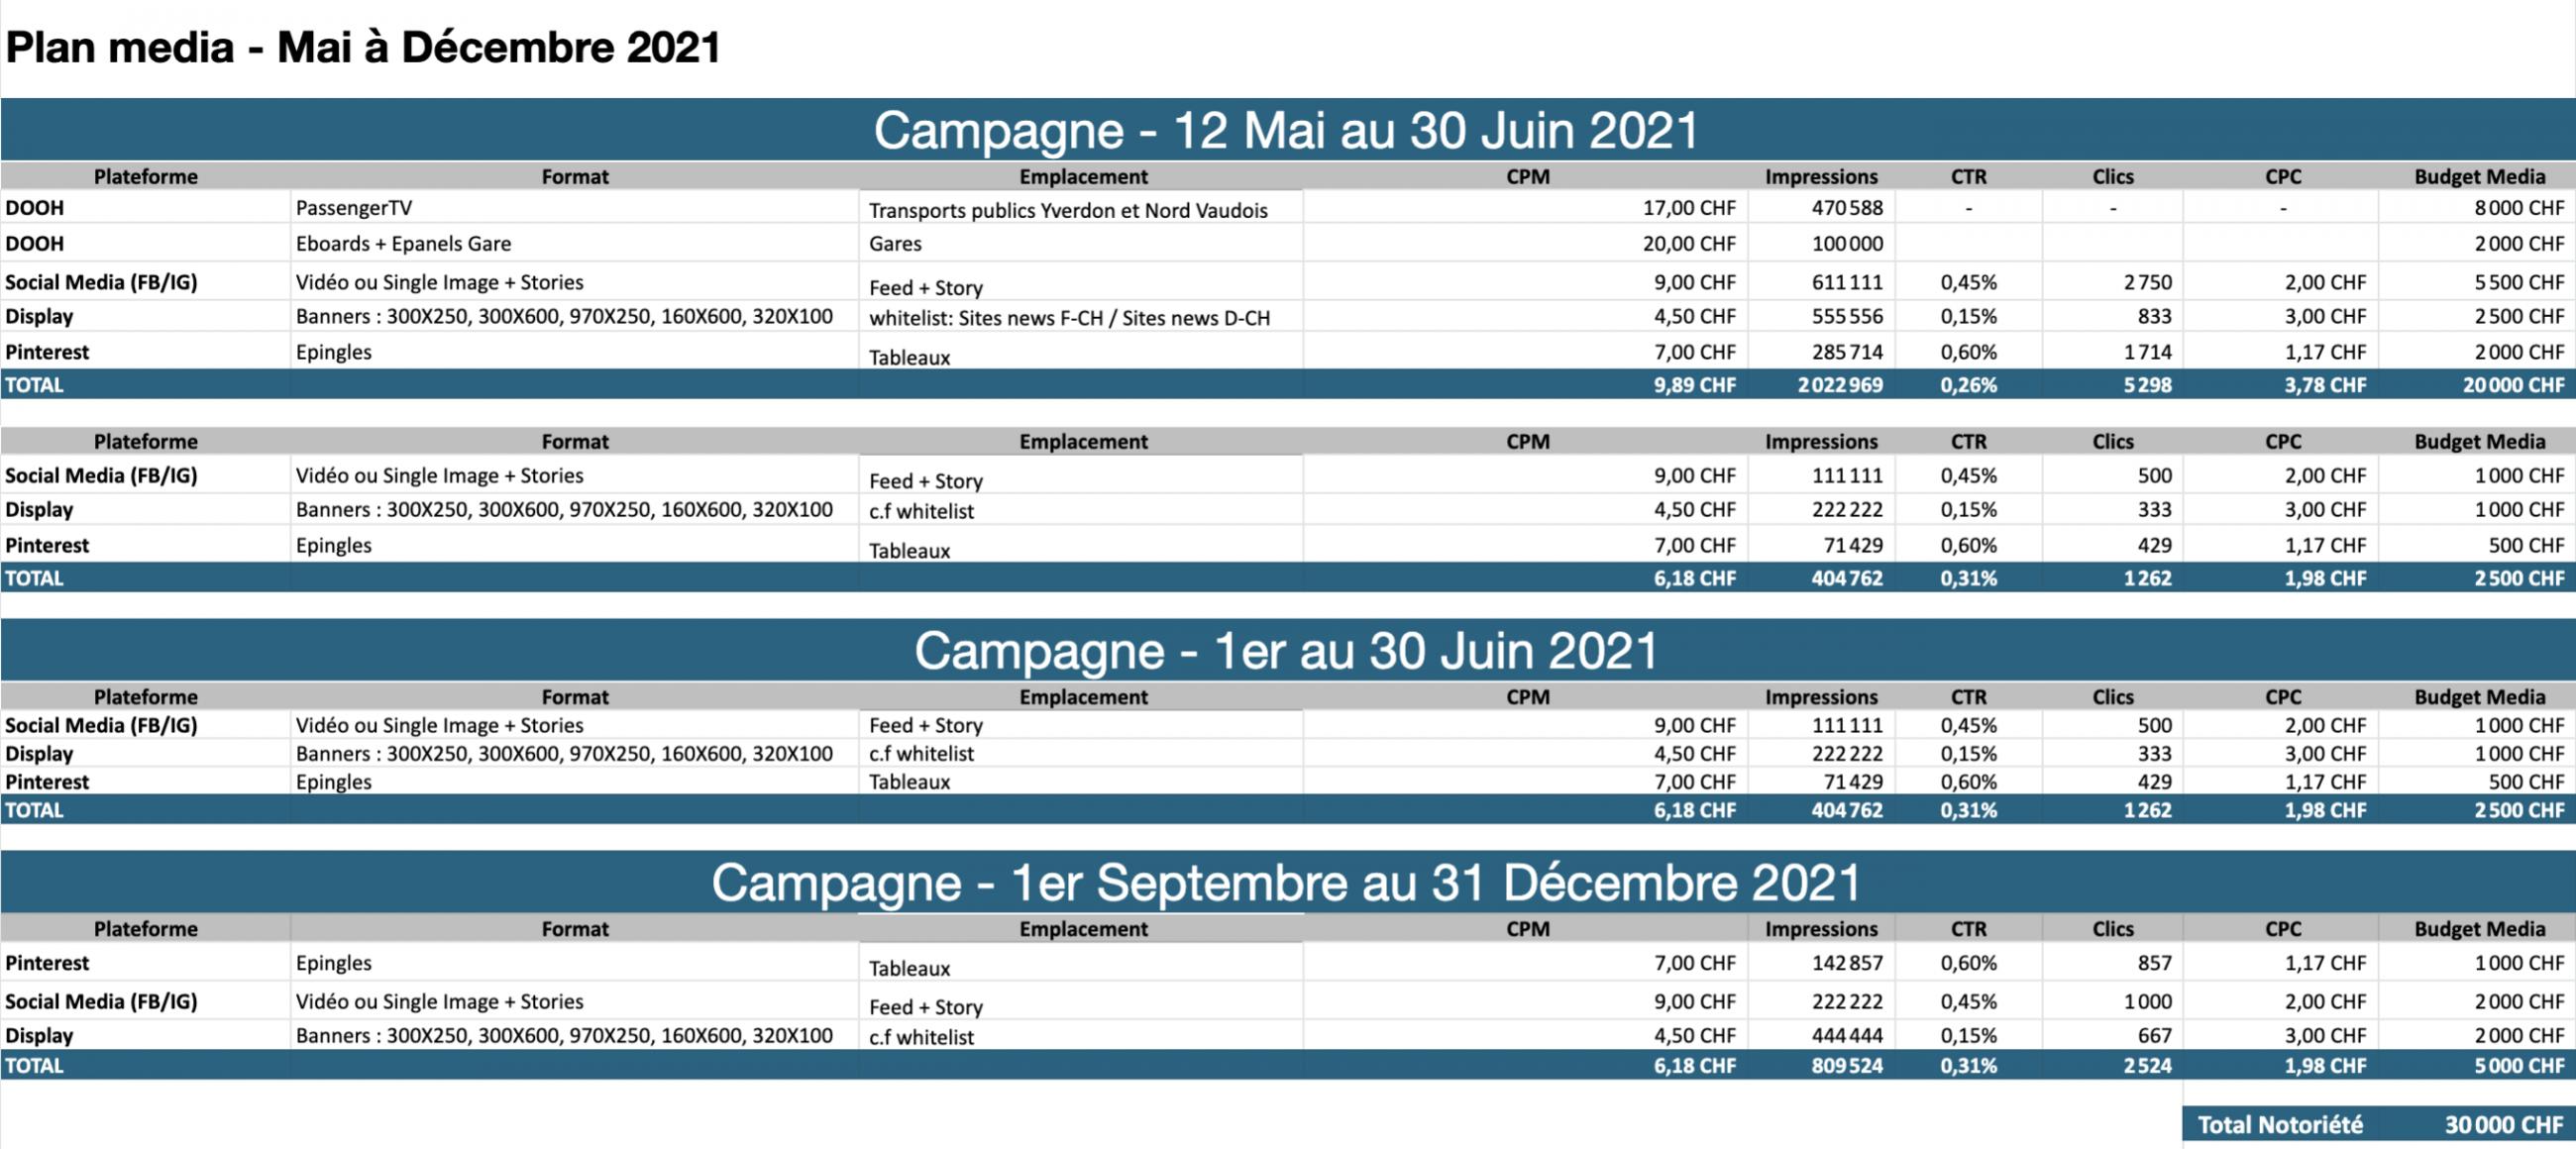 Plan Media. Strategie Achat Media. Stratégie Digitale,  Marketing digital. Stratégie média et acquisition